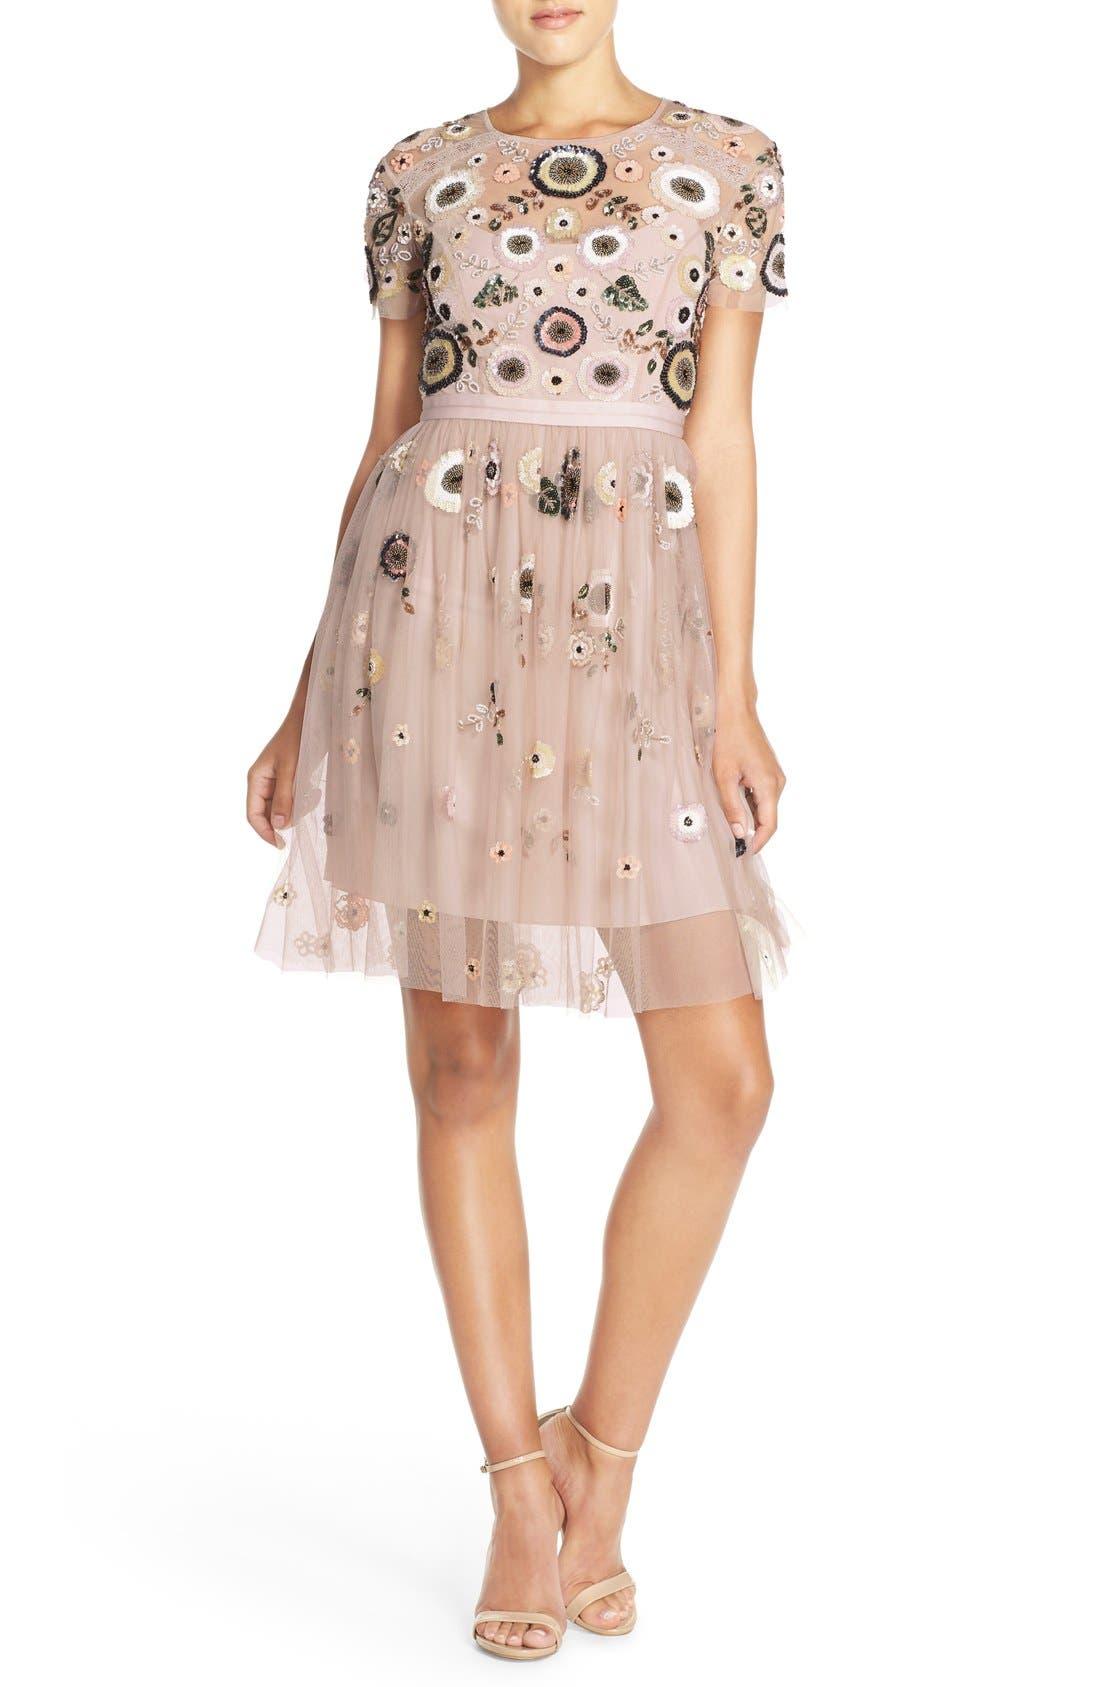 Alternate Image 1 Selected - Needle & Thread 'Woodland' Embellished Tulle Fit & Flare Dress